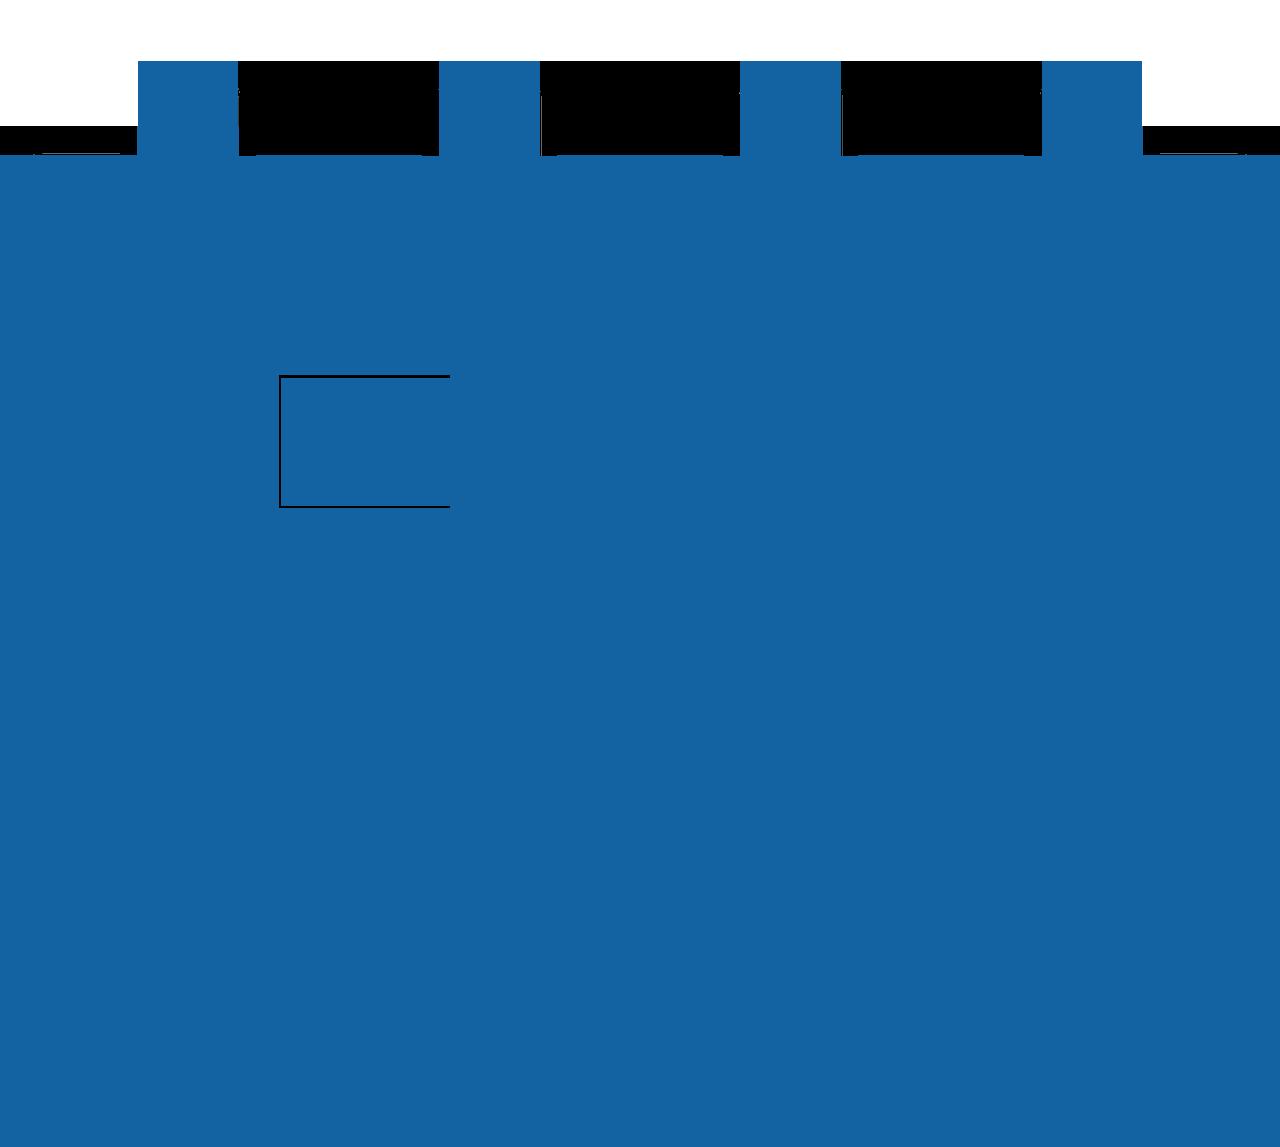 Kalendergrafik